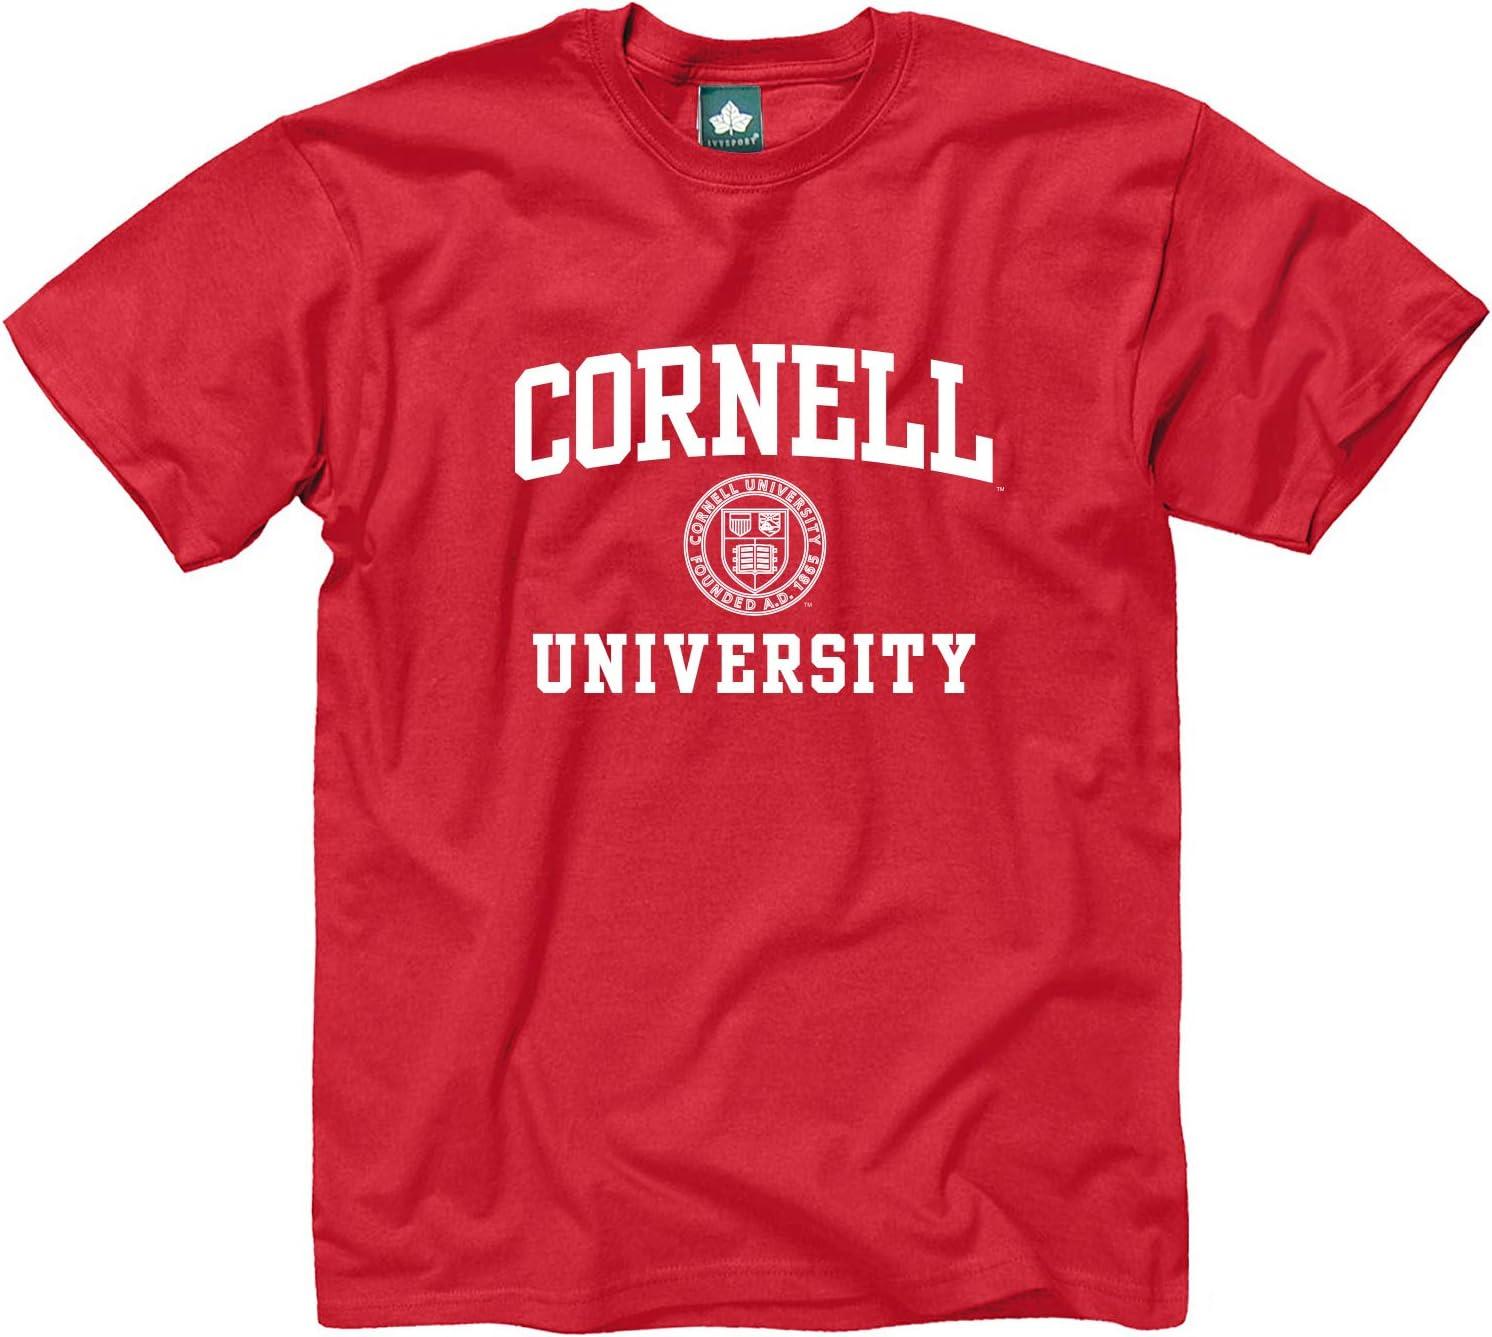 Cornell University camiseta por ivysport – Crest Logo, 100% algodón, rojo, manga corta camiseta - 1761-M, Rojo: Amazon.es: Deportes y aire libre